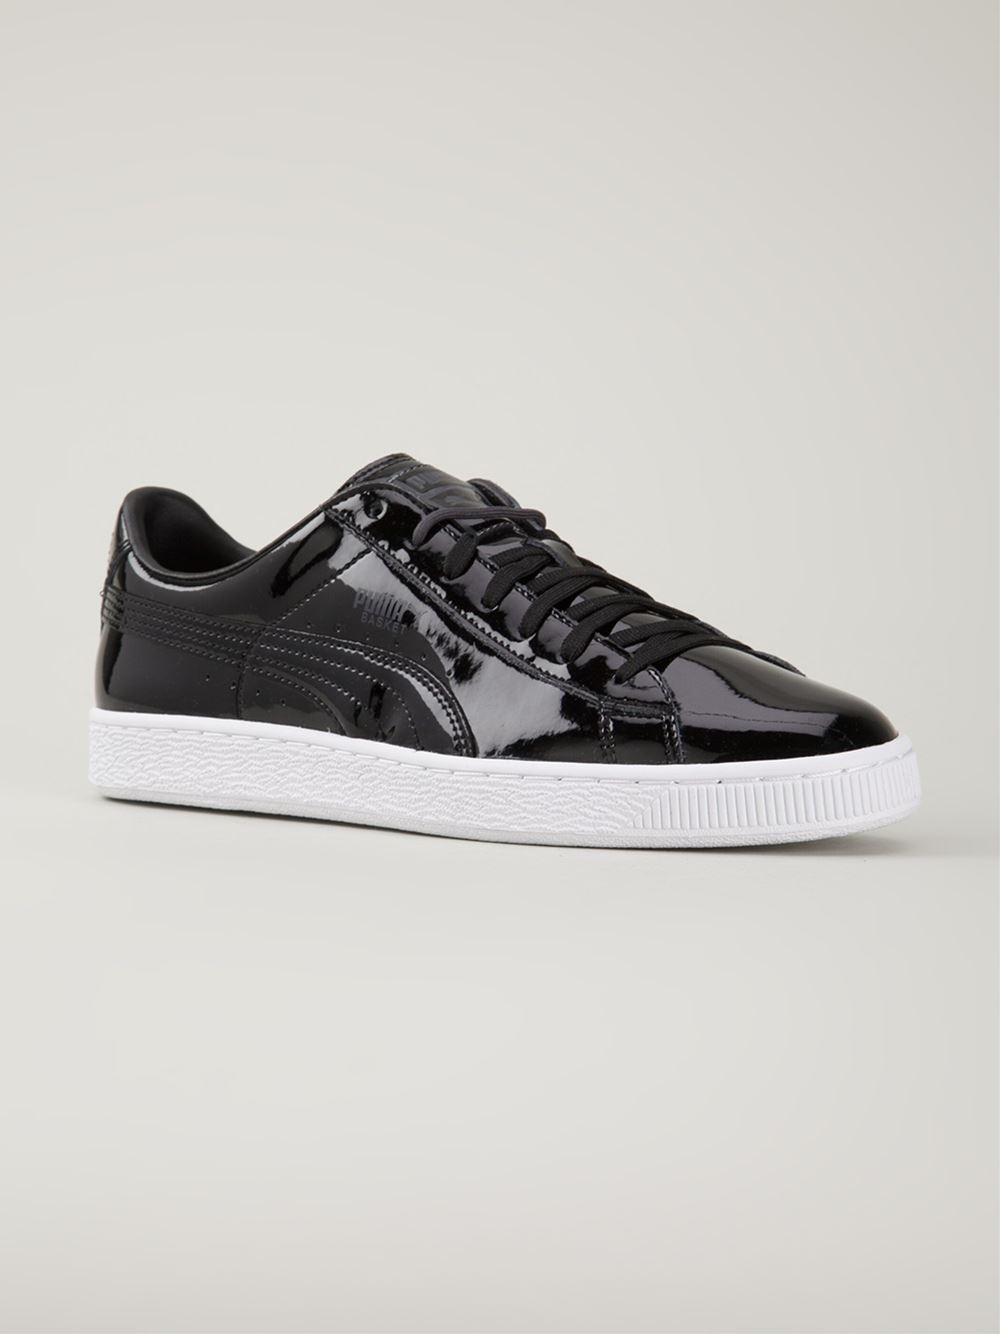 60a3e656eb503e Lyst - PUMA  Basket Classic Patent  Sneakers in Black for Men